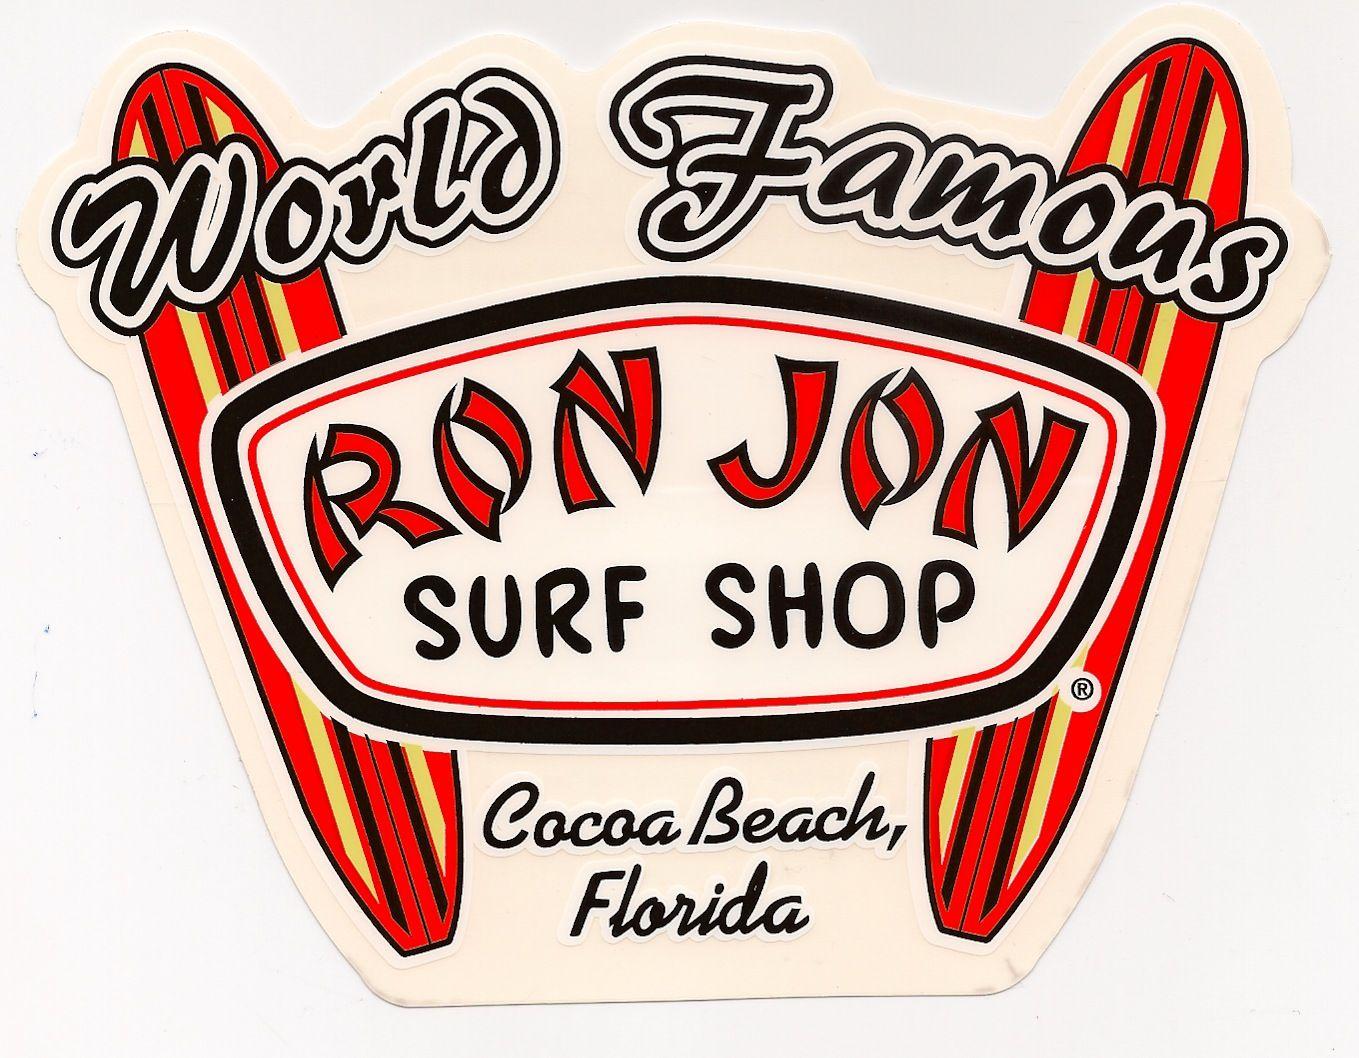 Ron Jon Surfshop Great Places I Ve Been Surf Shop